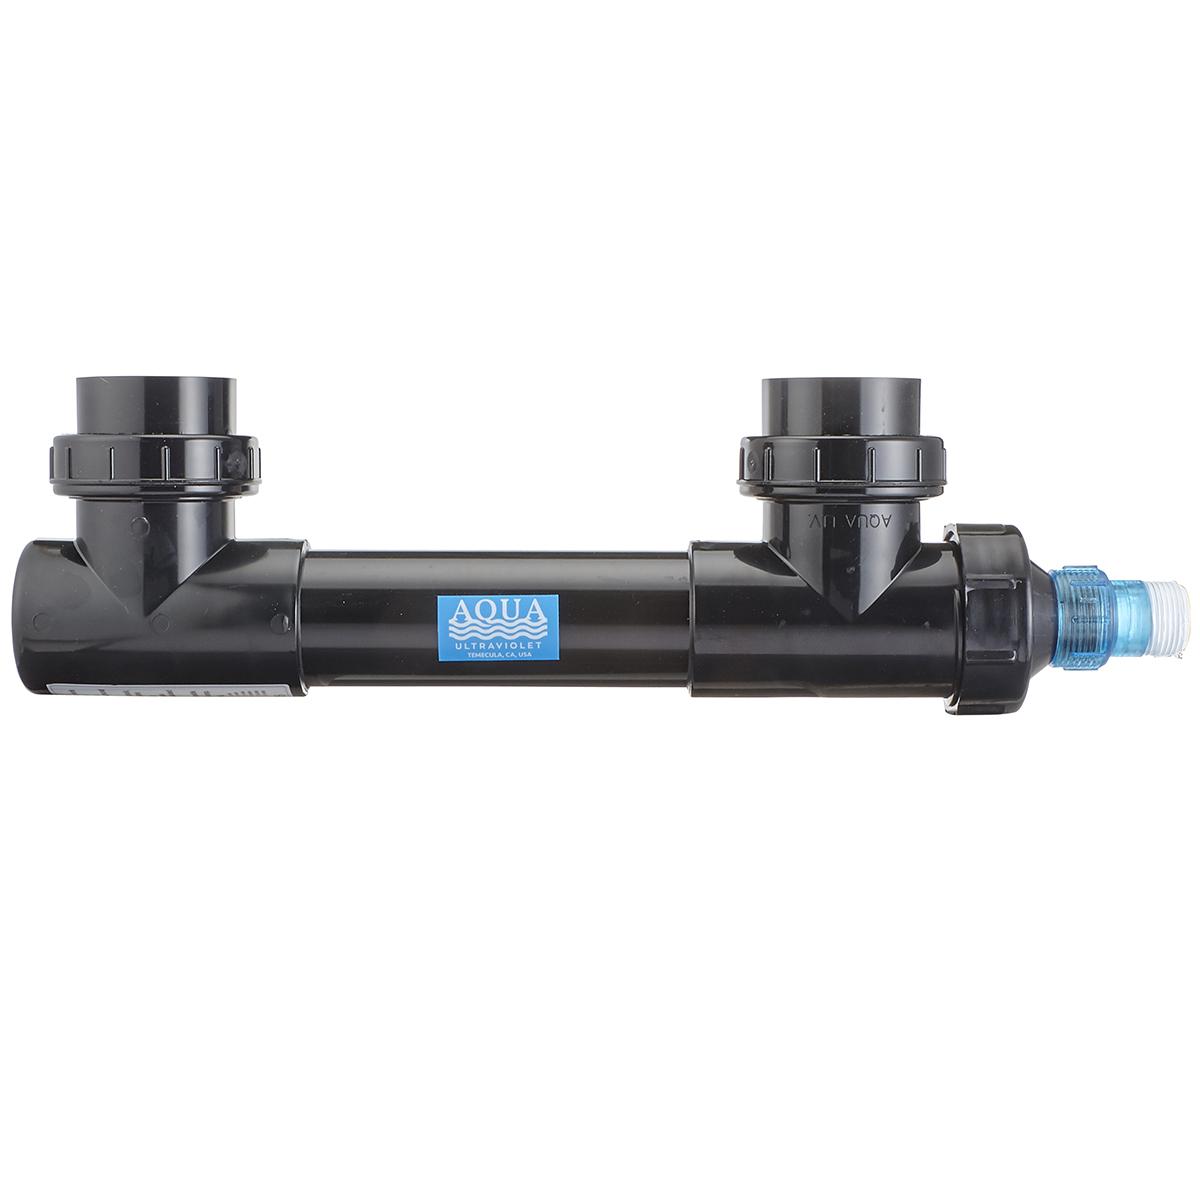 25 Watt Classic Uv Sterilizer Black Body Aqua